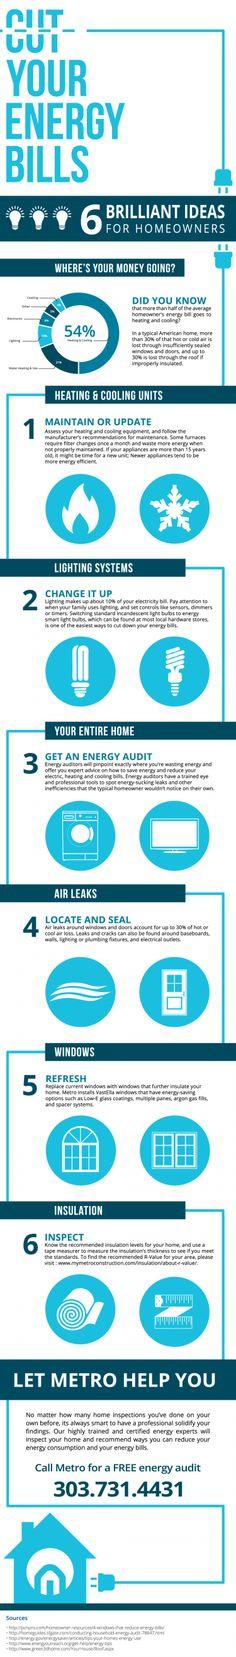 6 Brilliant Ways to Cut #Energy Bills Infographic